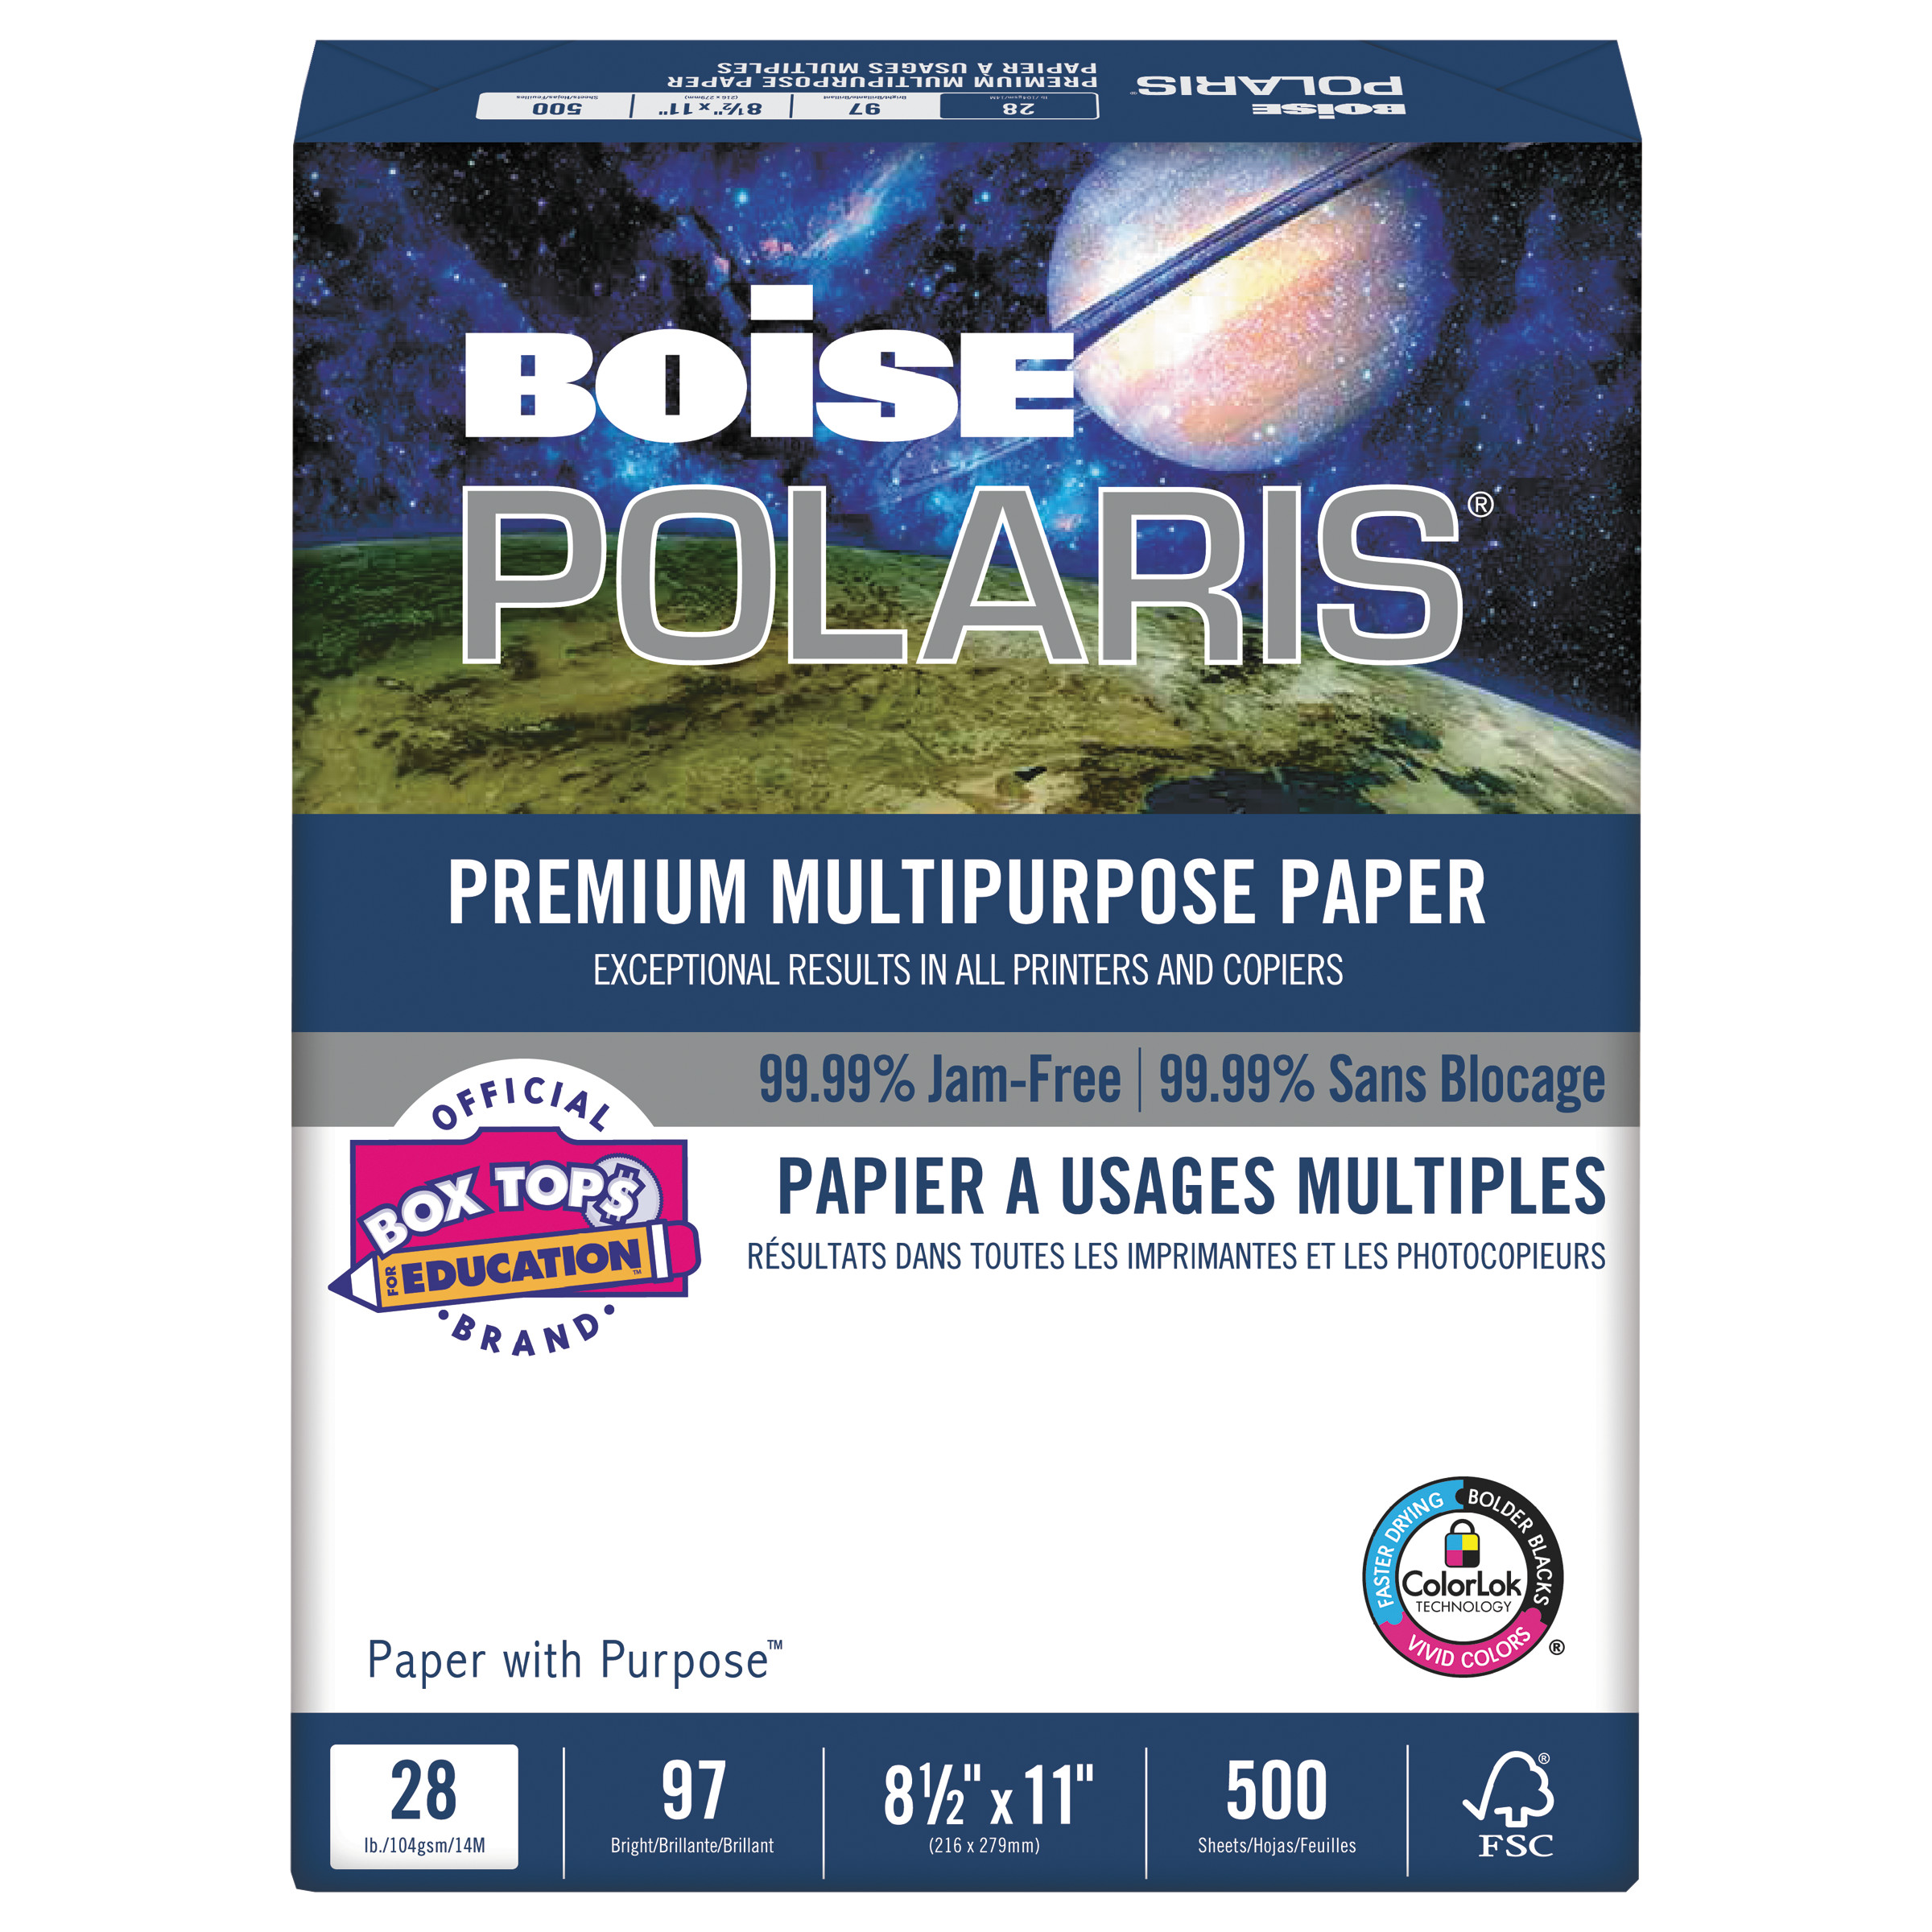 "Boise POLARIS 28-lb Premium Multipurpose Paper, 8-1/2"" x 11"", White, 3000 Sheets"